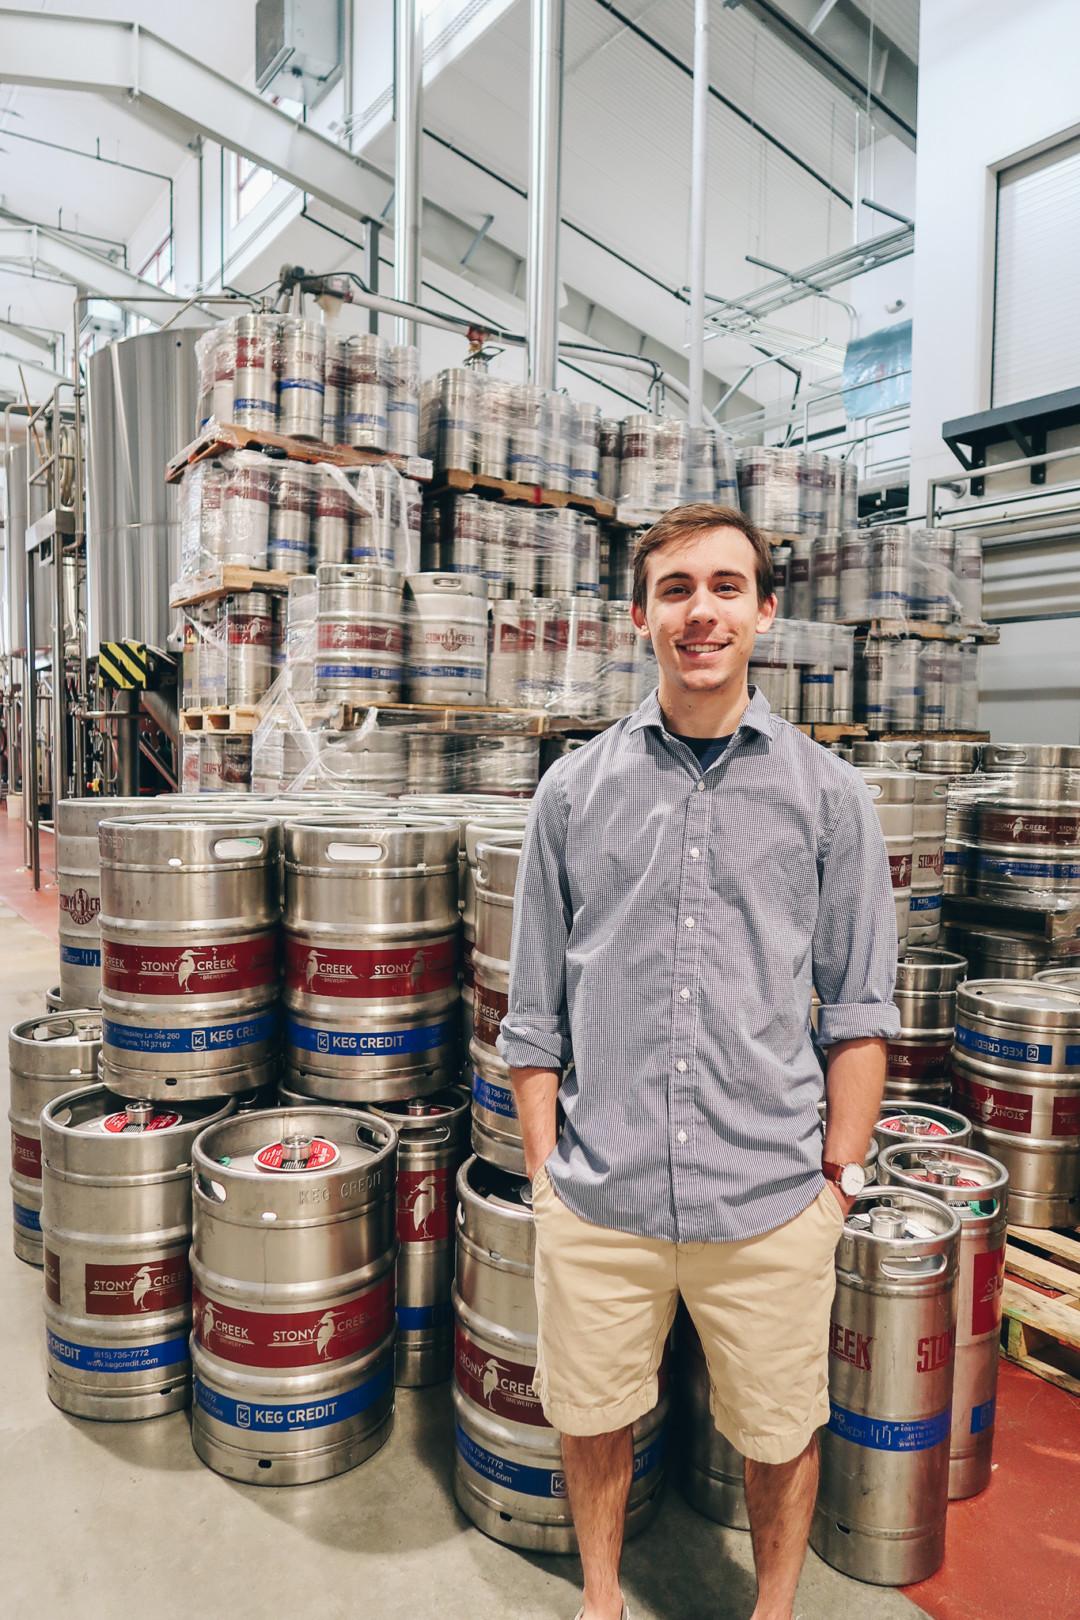 Dan touring the Stony Creek Brewery, Branford, CT